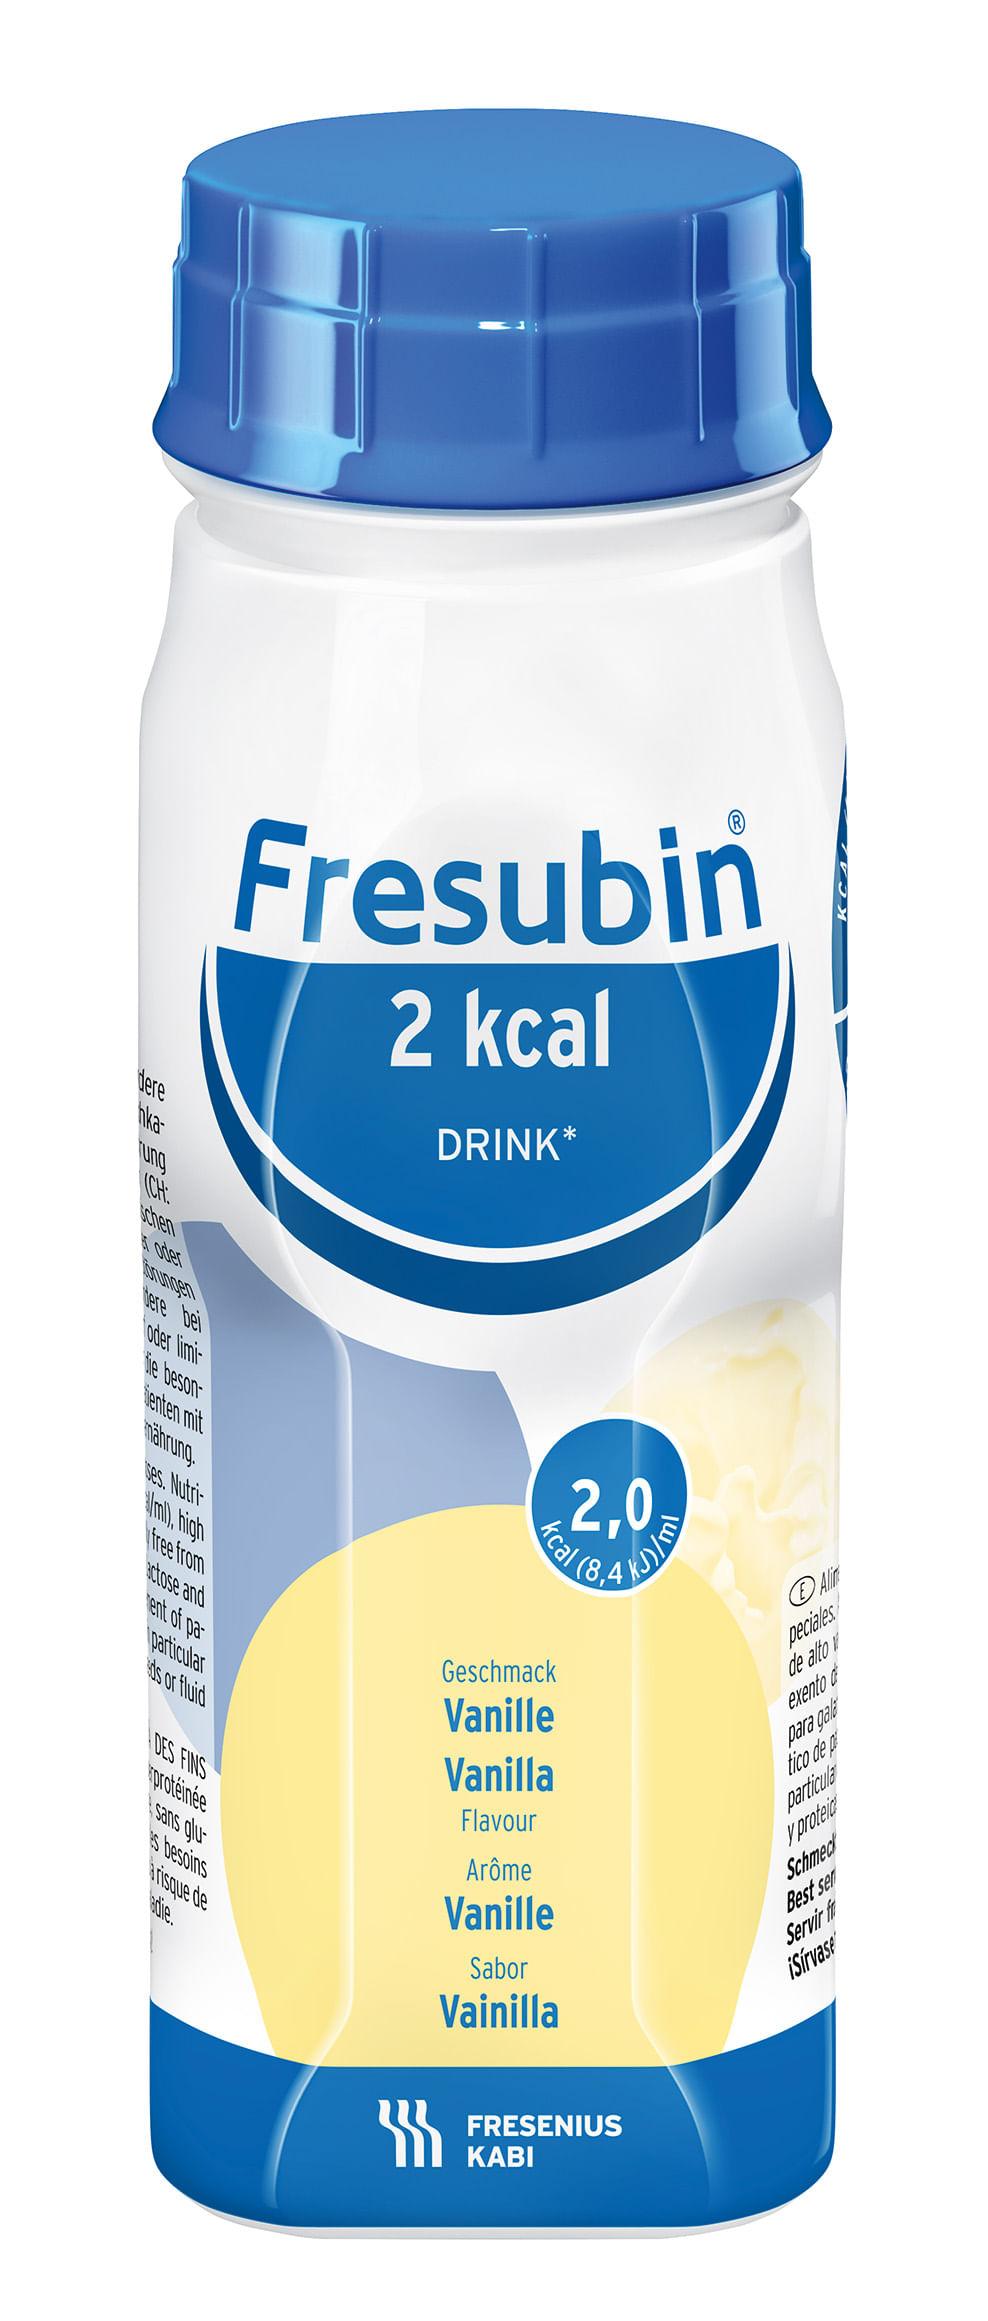 Fresubin_2kcal_Vanilla_EBo_Frontal